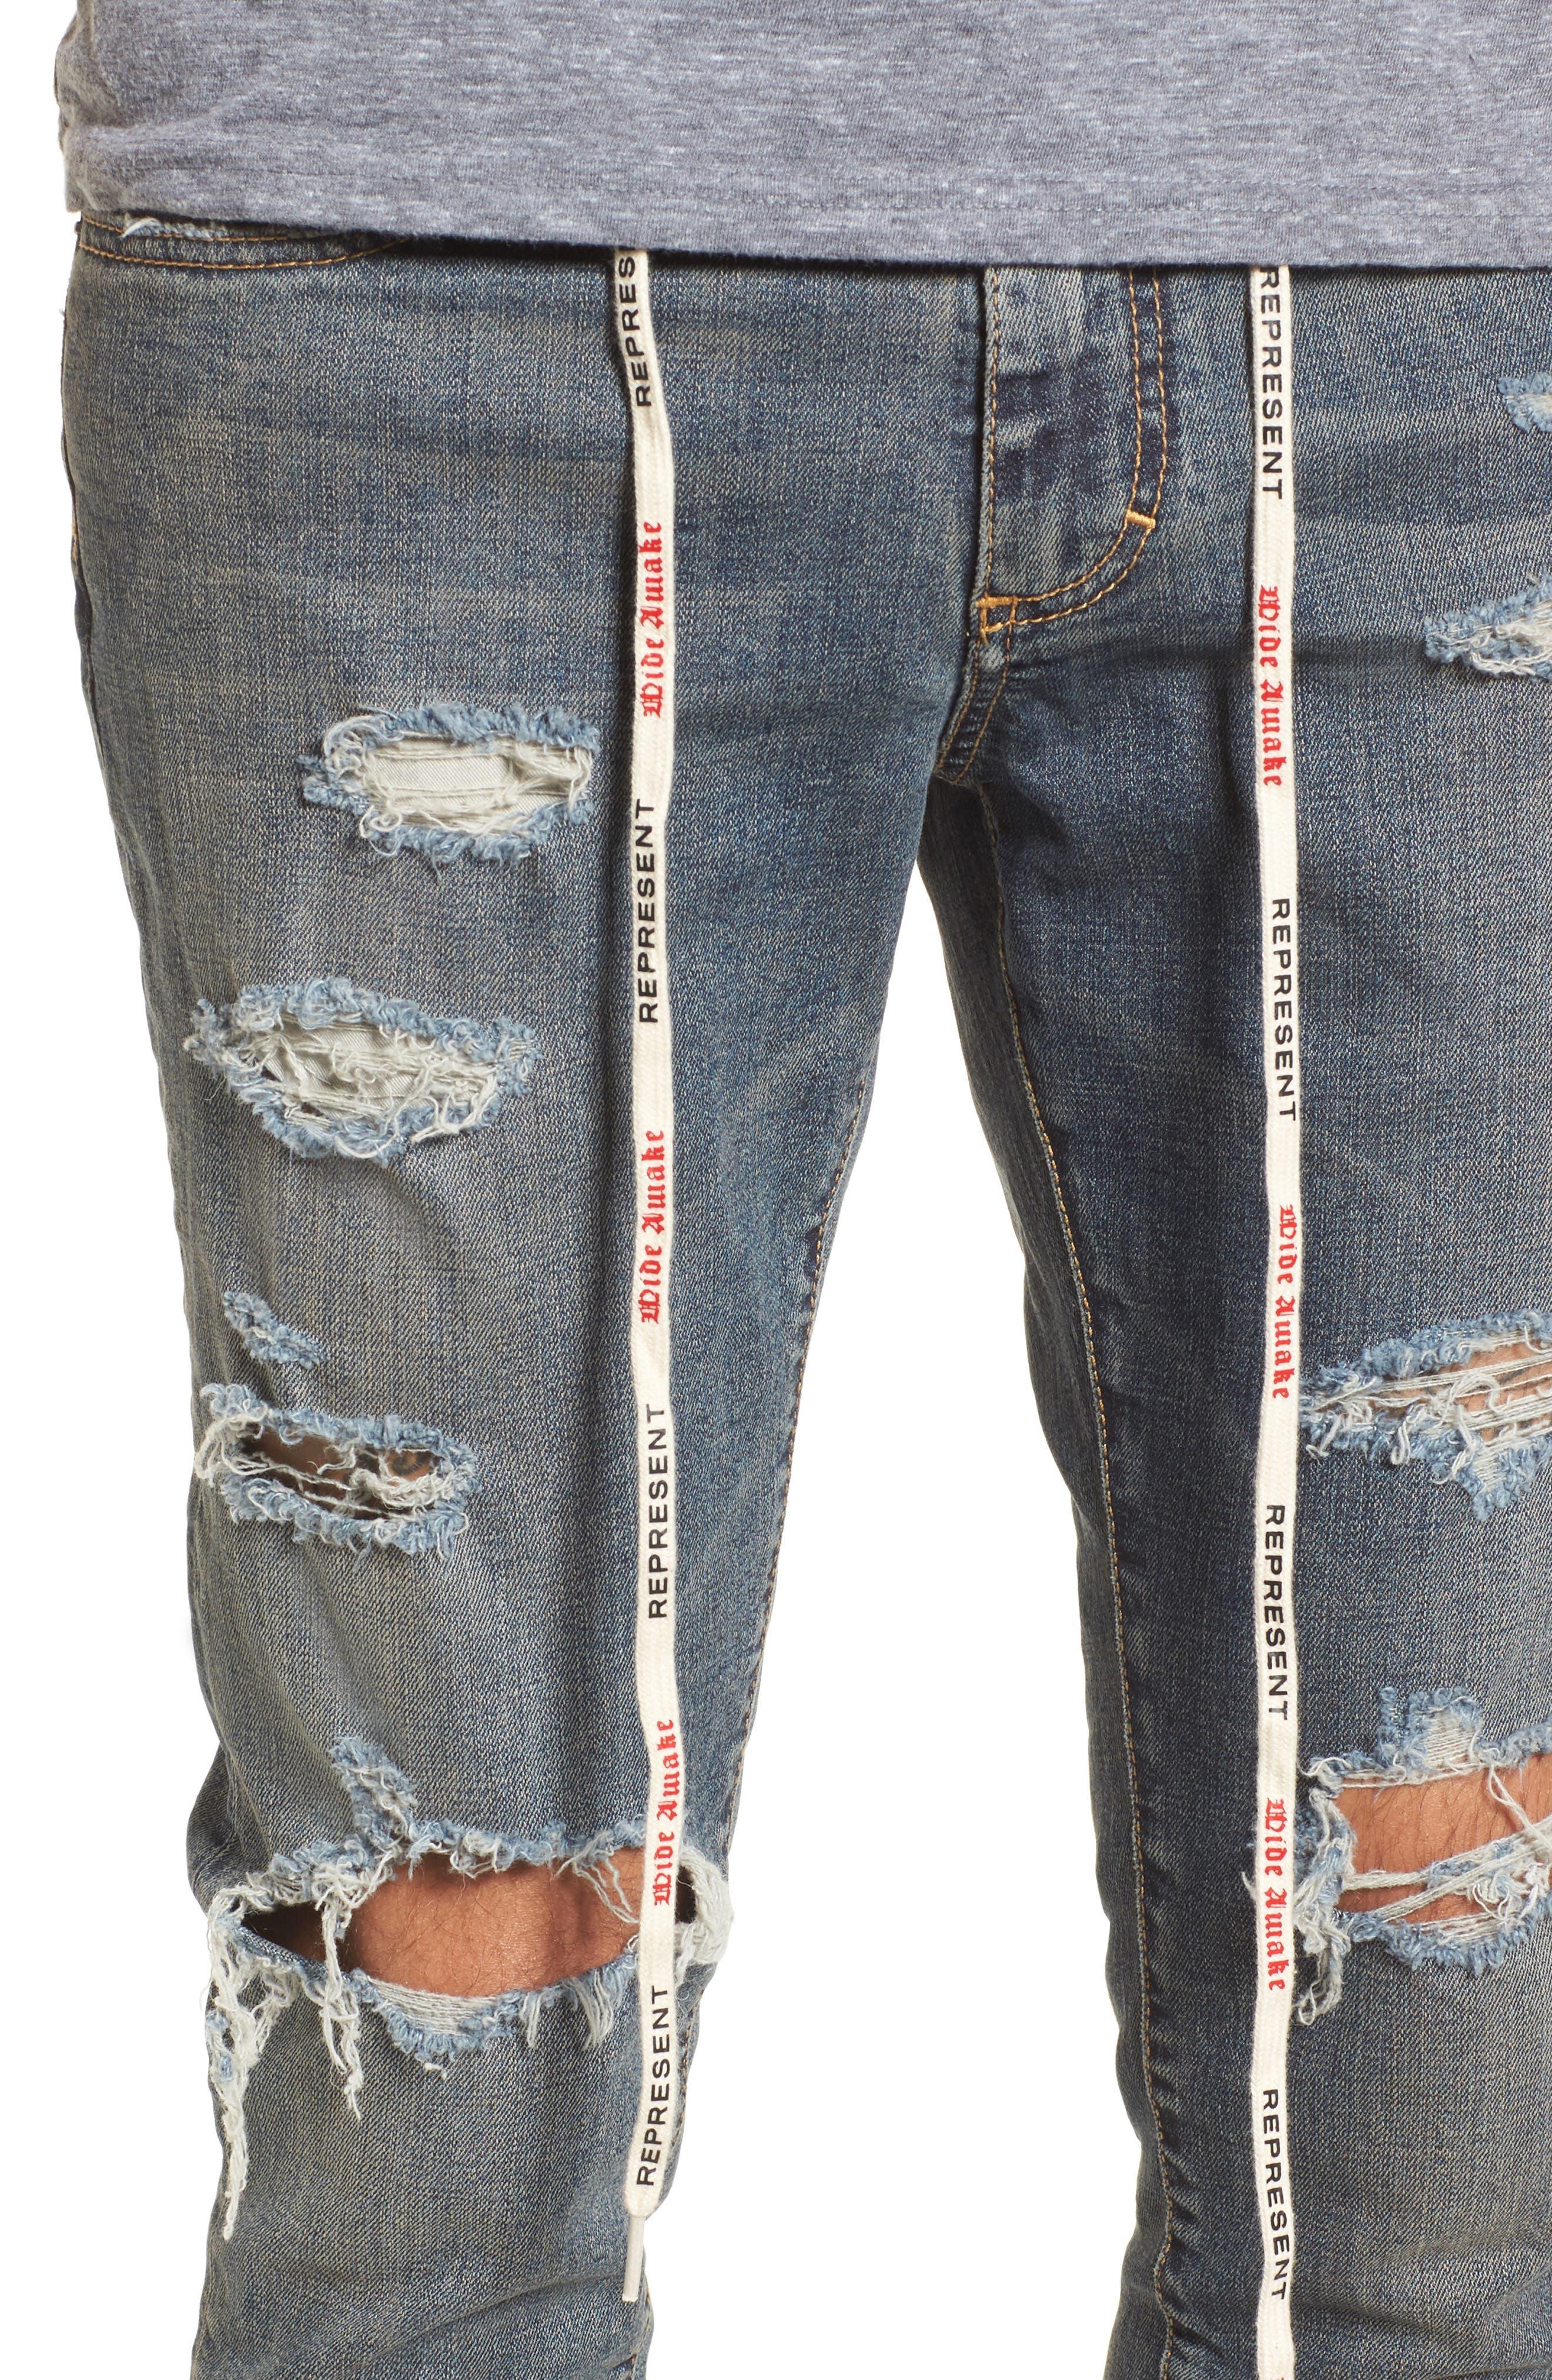 Repairer Slim Fit Denim Pants,                             Alternate thumbnail 4, color,                             Rockstar Blue